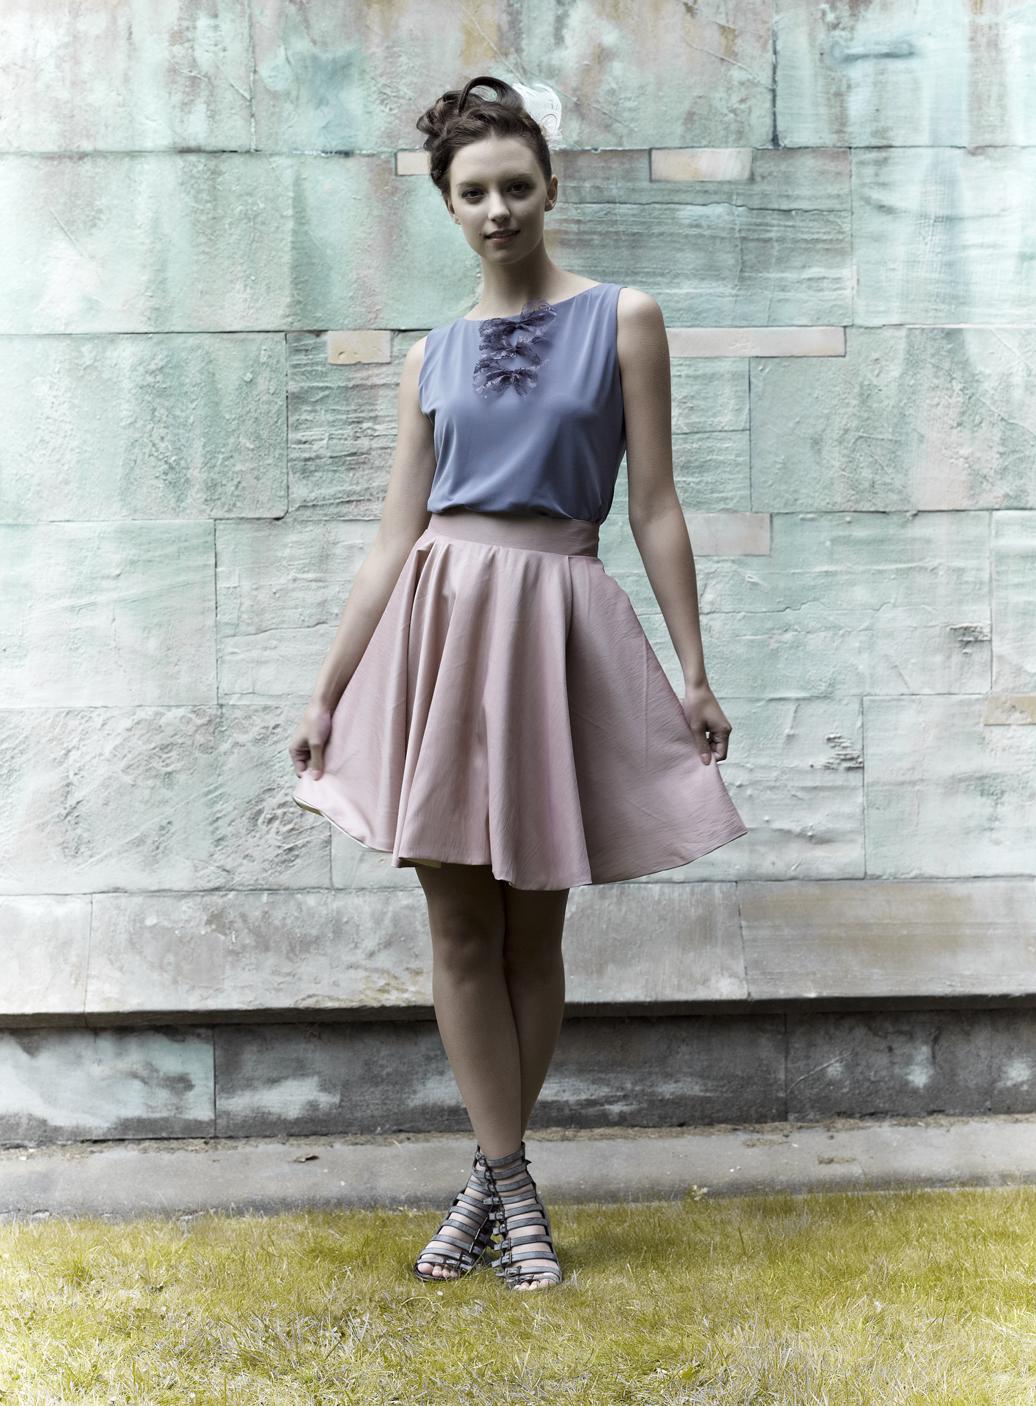 Label Love Kelly Ewing Fashion Daydreams UK Fashion And Lifestyle Blog By Reena Rai